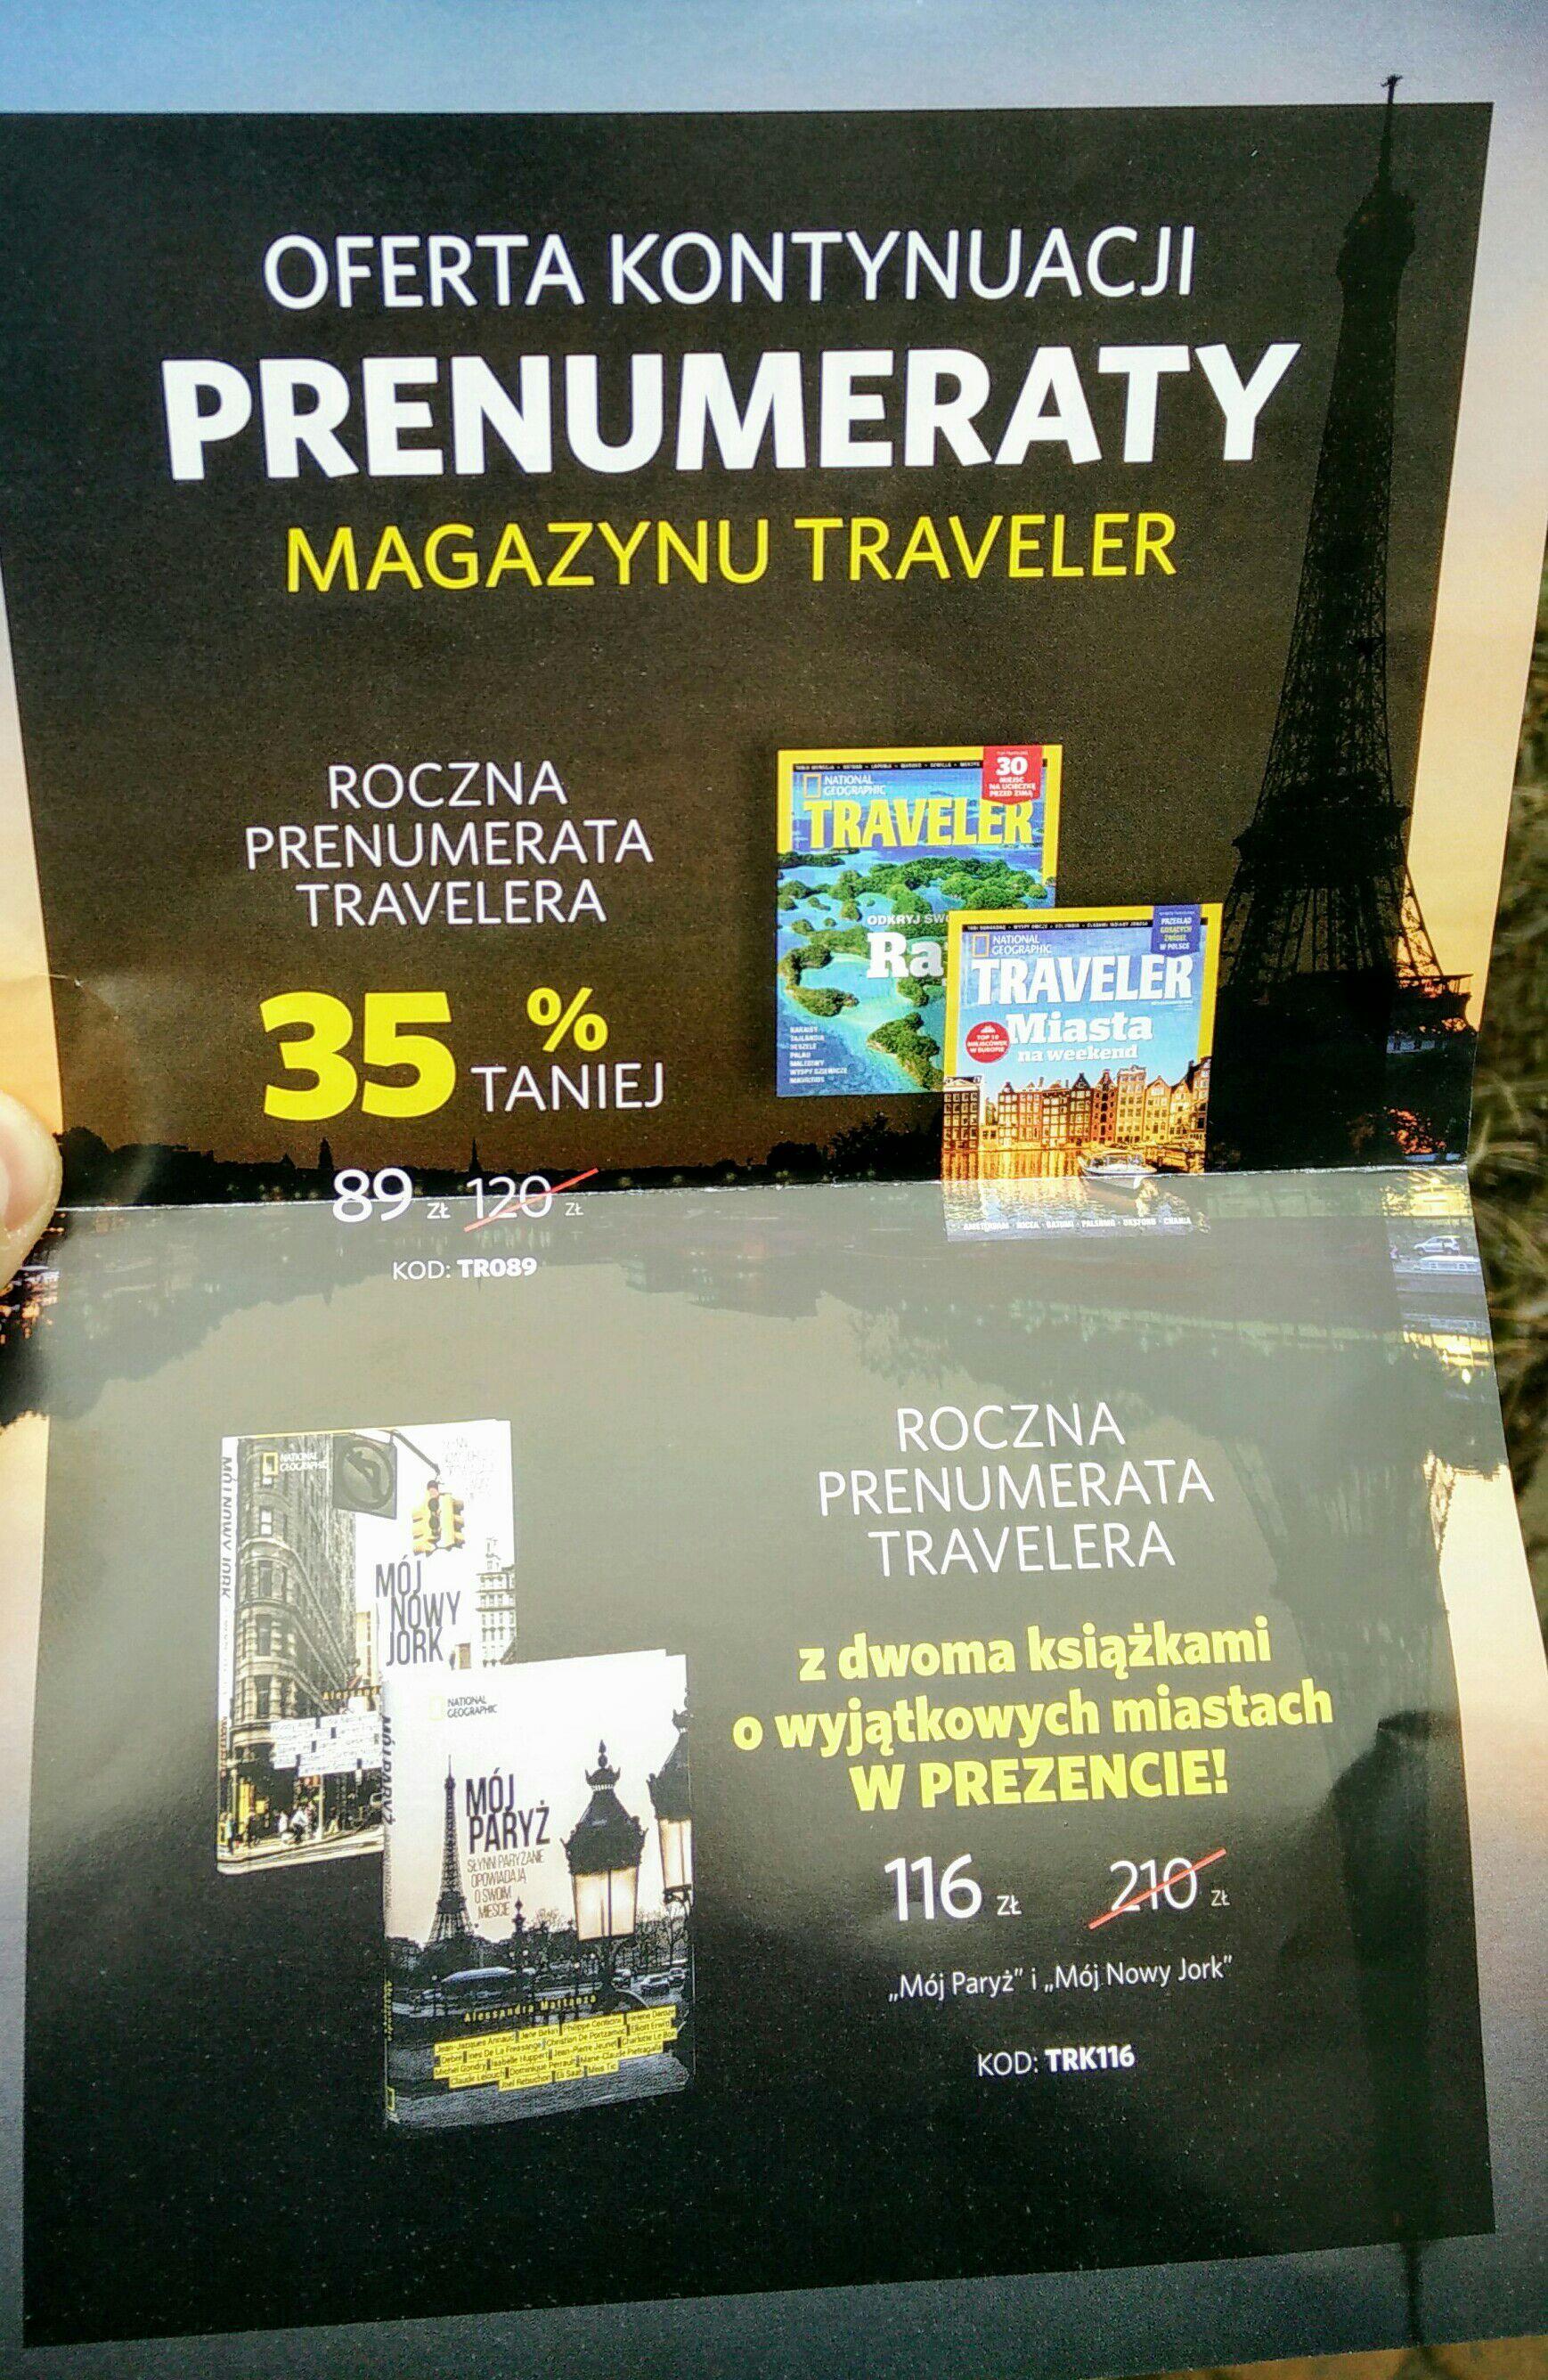 Prenumerata Traveler